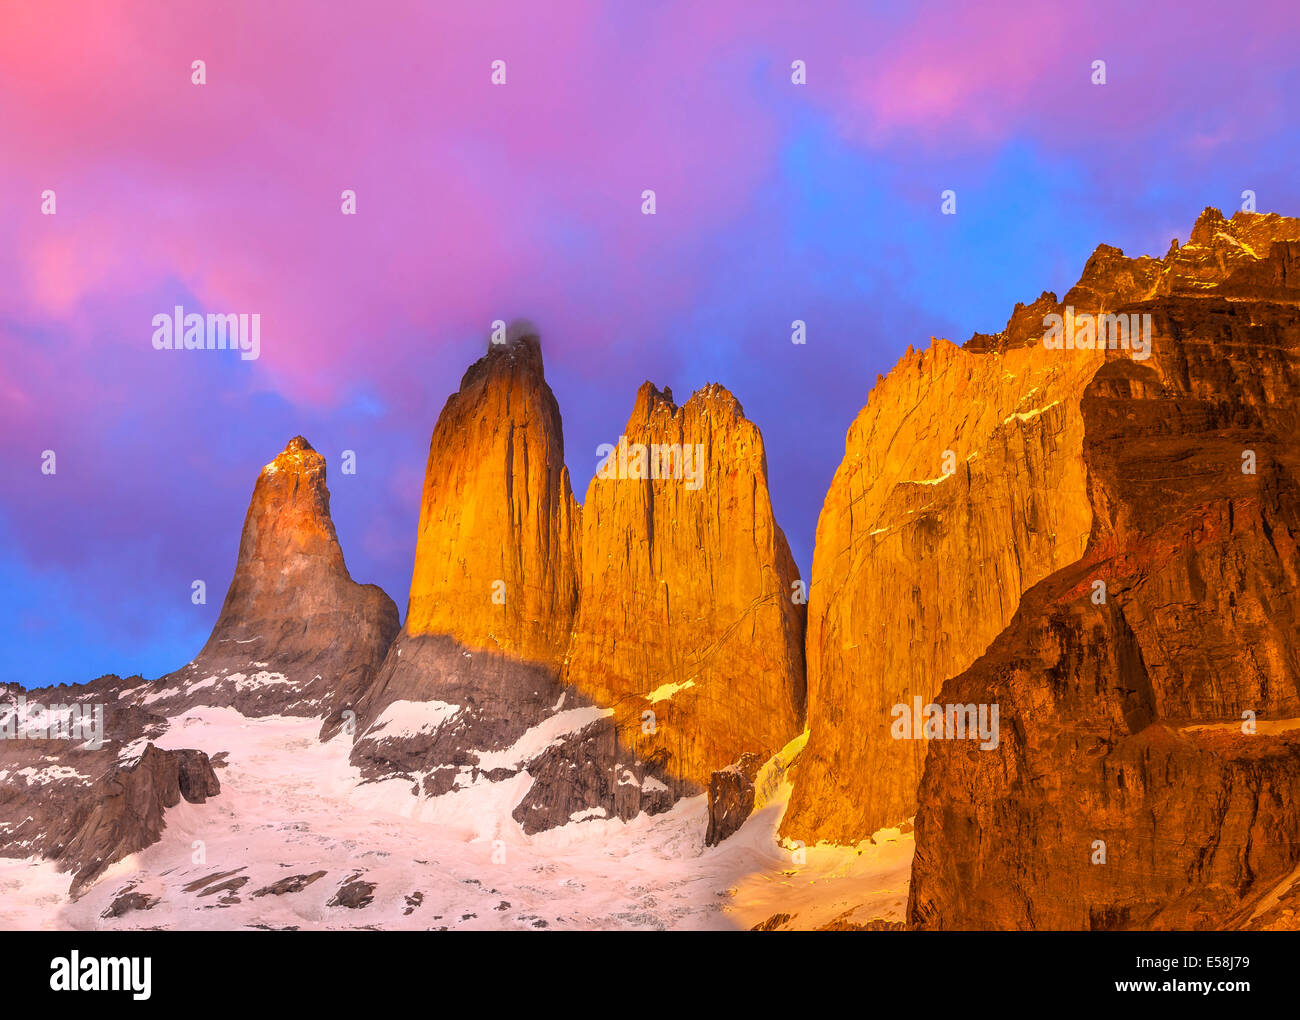 Bellissima alba nel parco nazionale Torres del Paine, Patagonia, Cile Immagini Stock